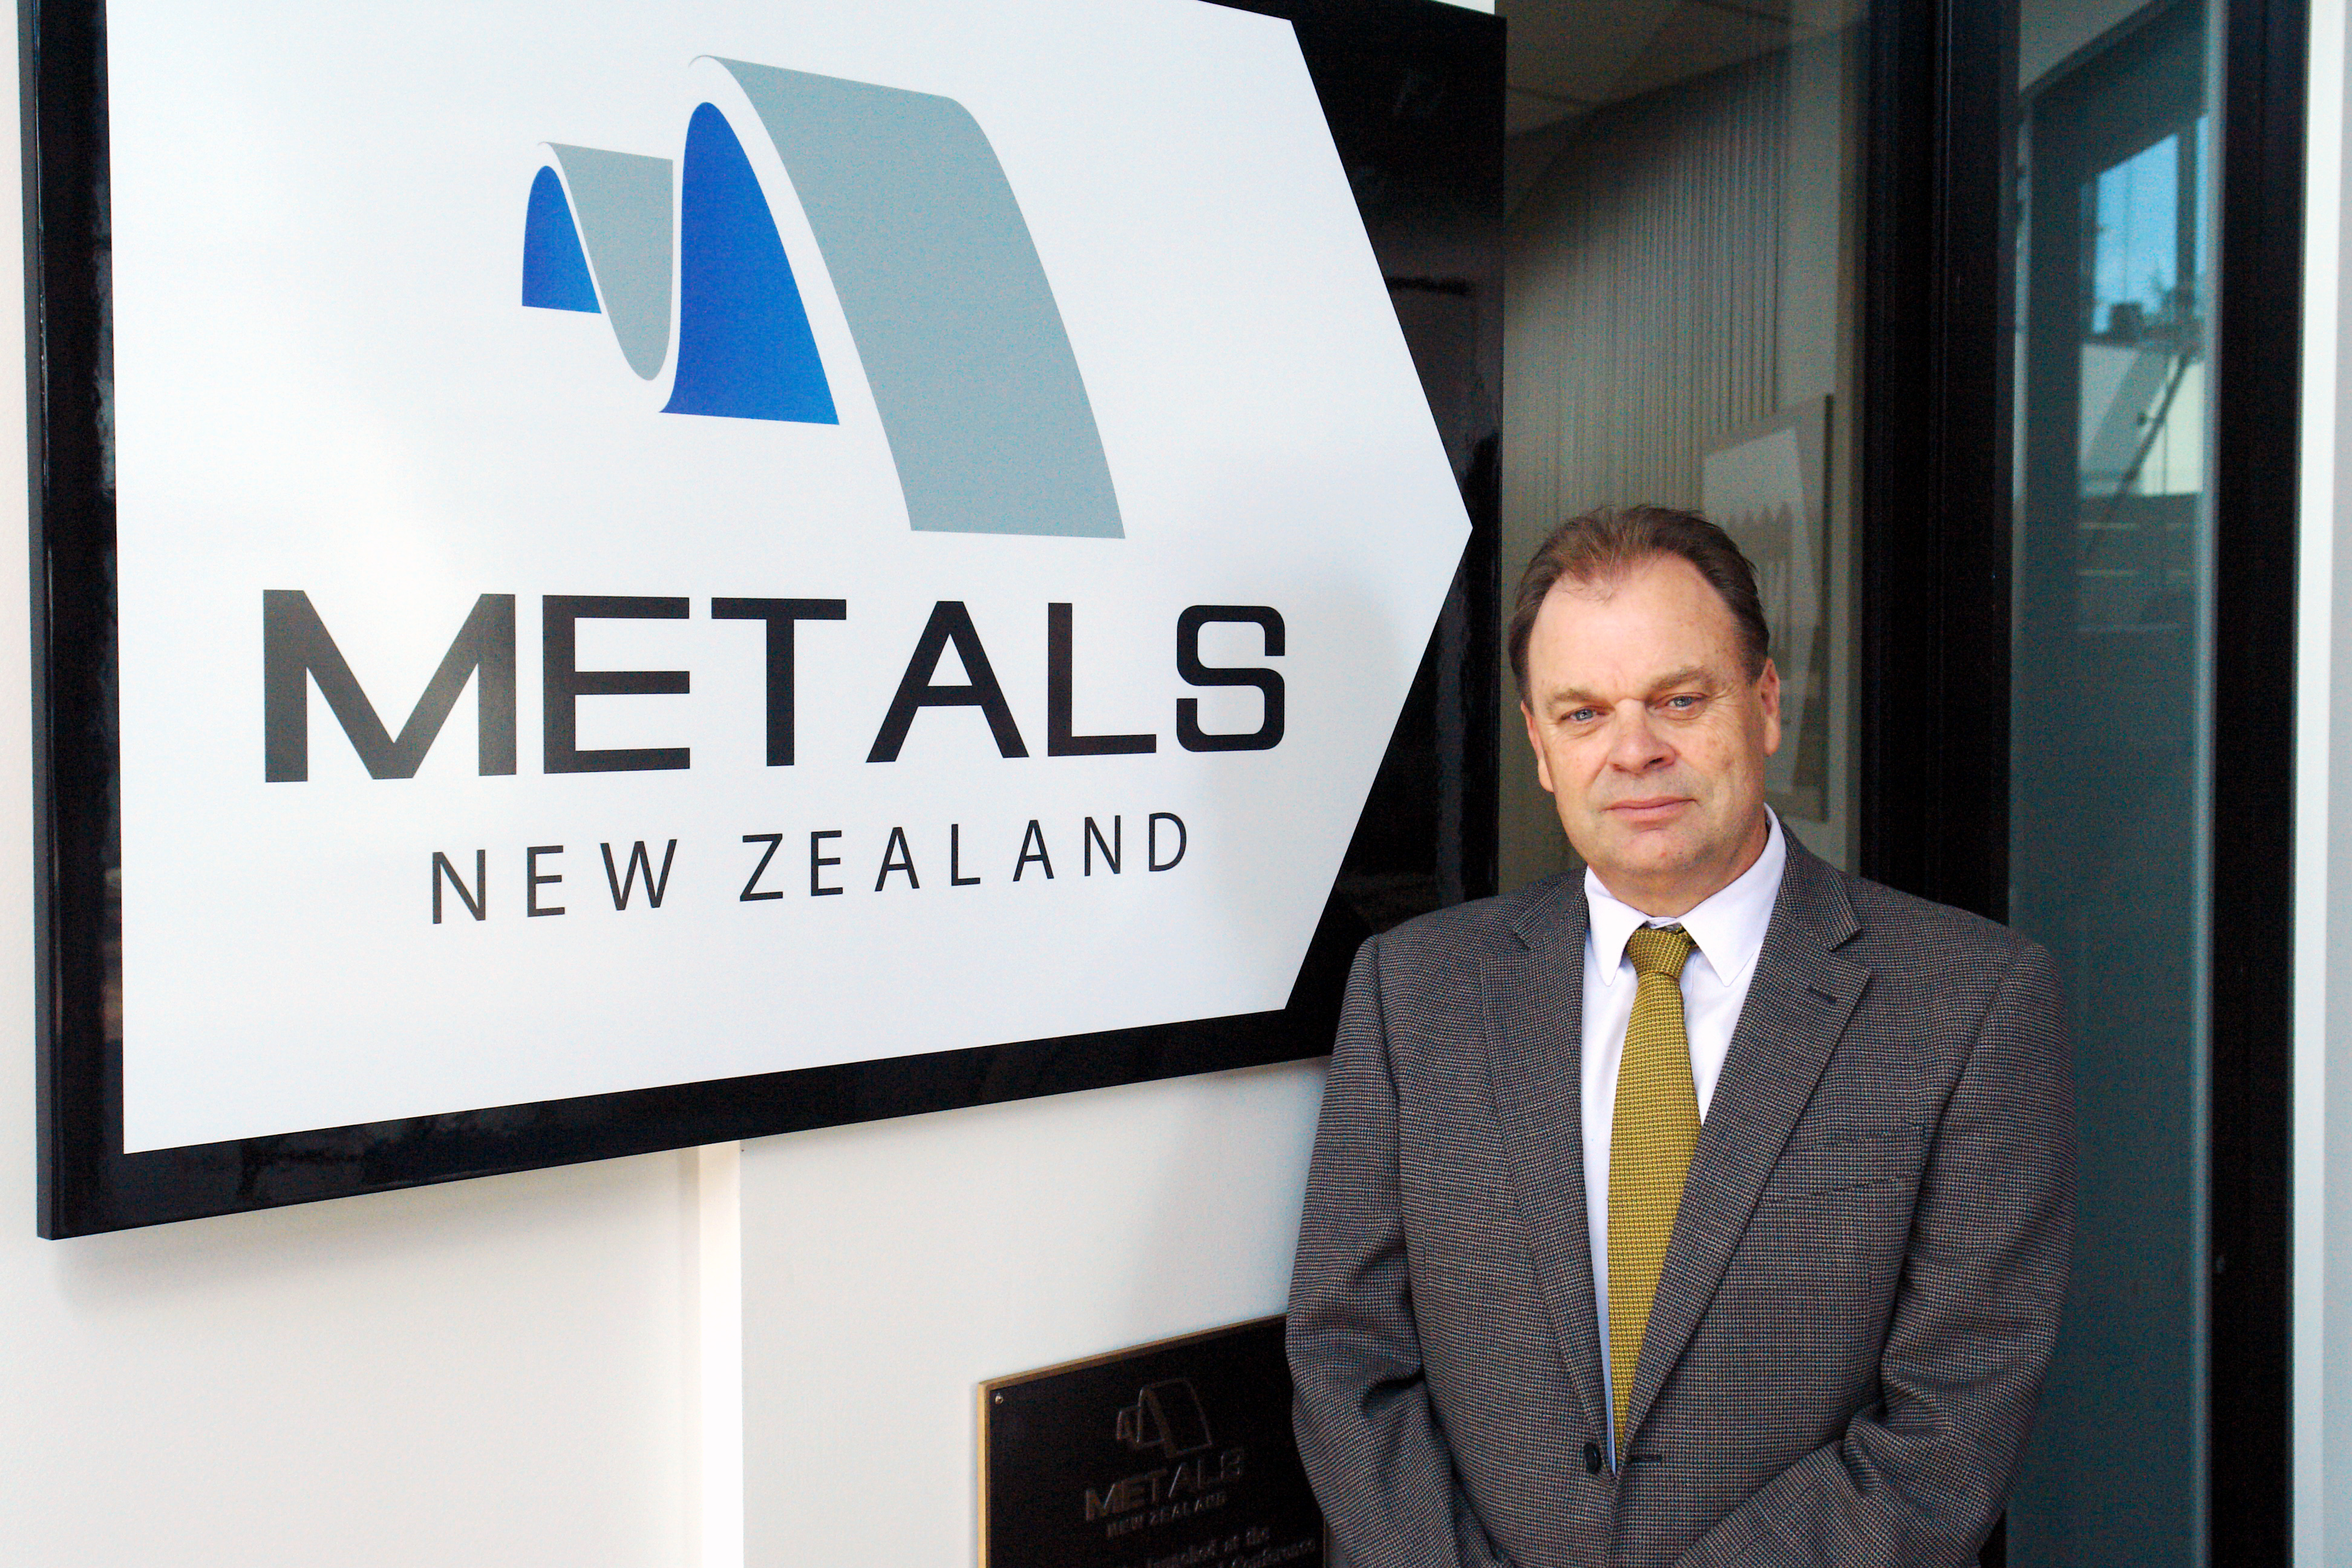 Steel Industry in Crisis